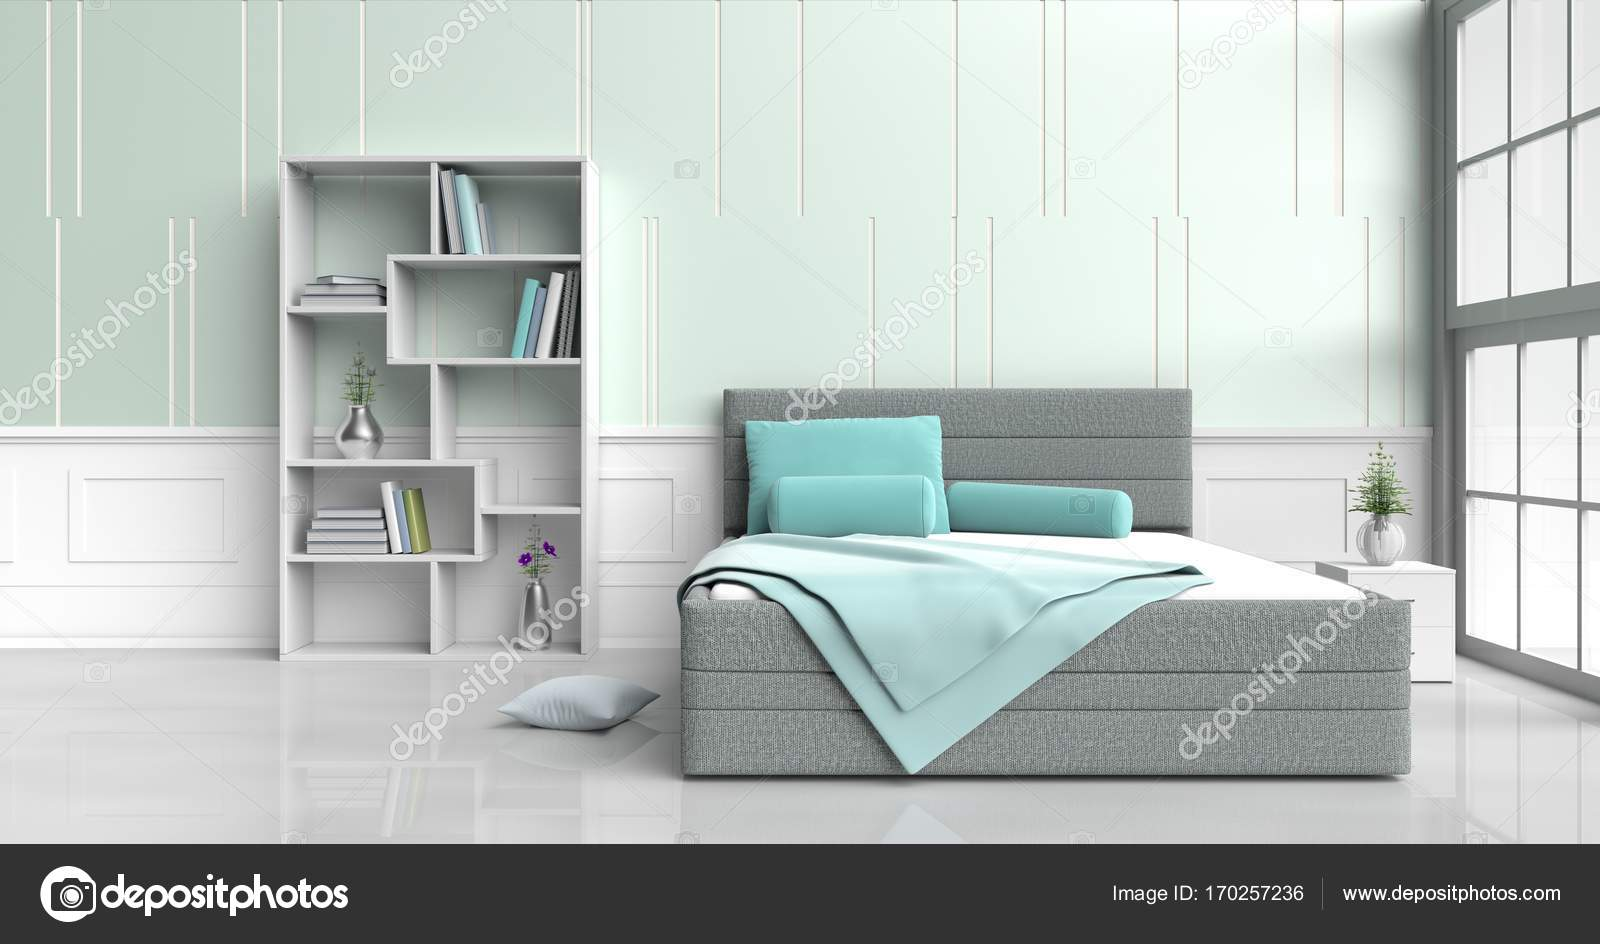 wit groen slaapkamer ingericht met boom in glazen vaas groene kussens houten nachttafel boekenkast groene deken venster groen witte cement muur is